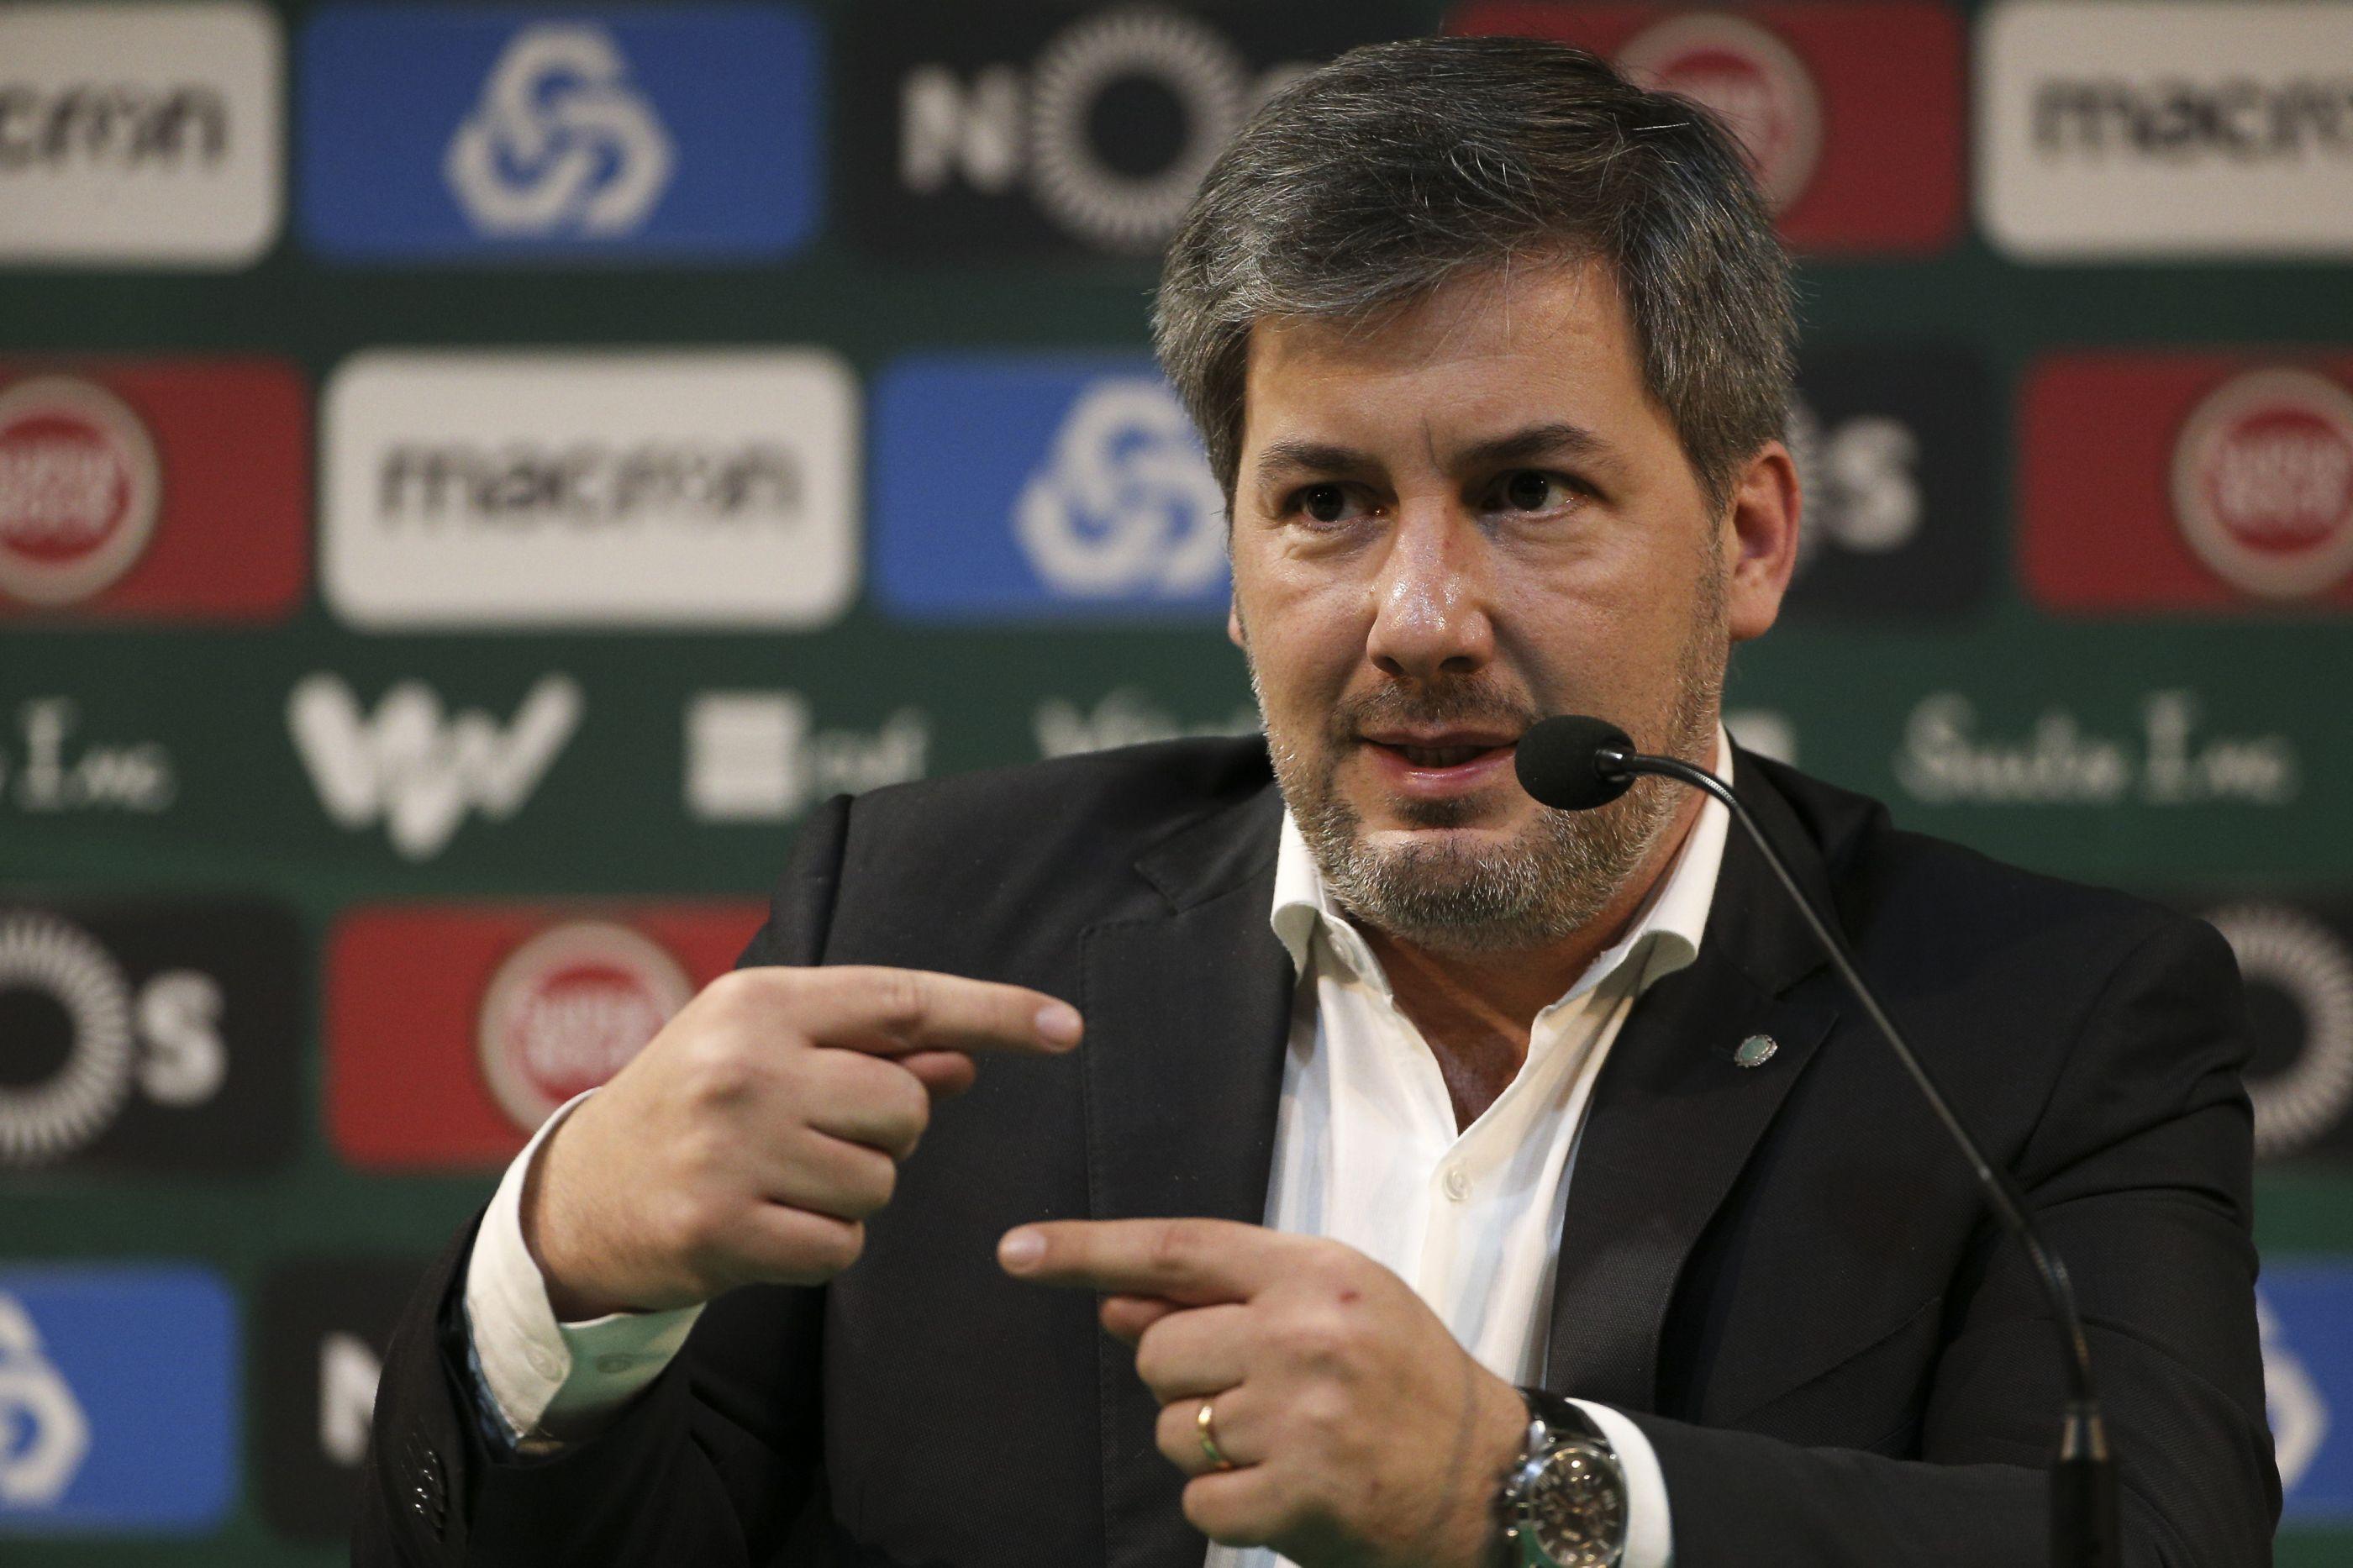 Bruno de Carvalho indiciado por 56 crimes